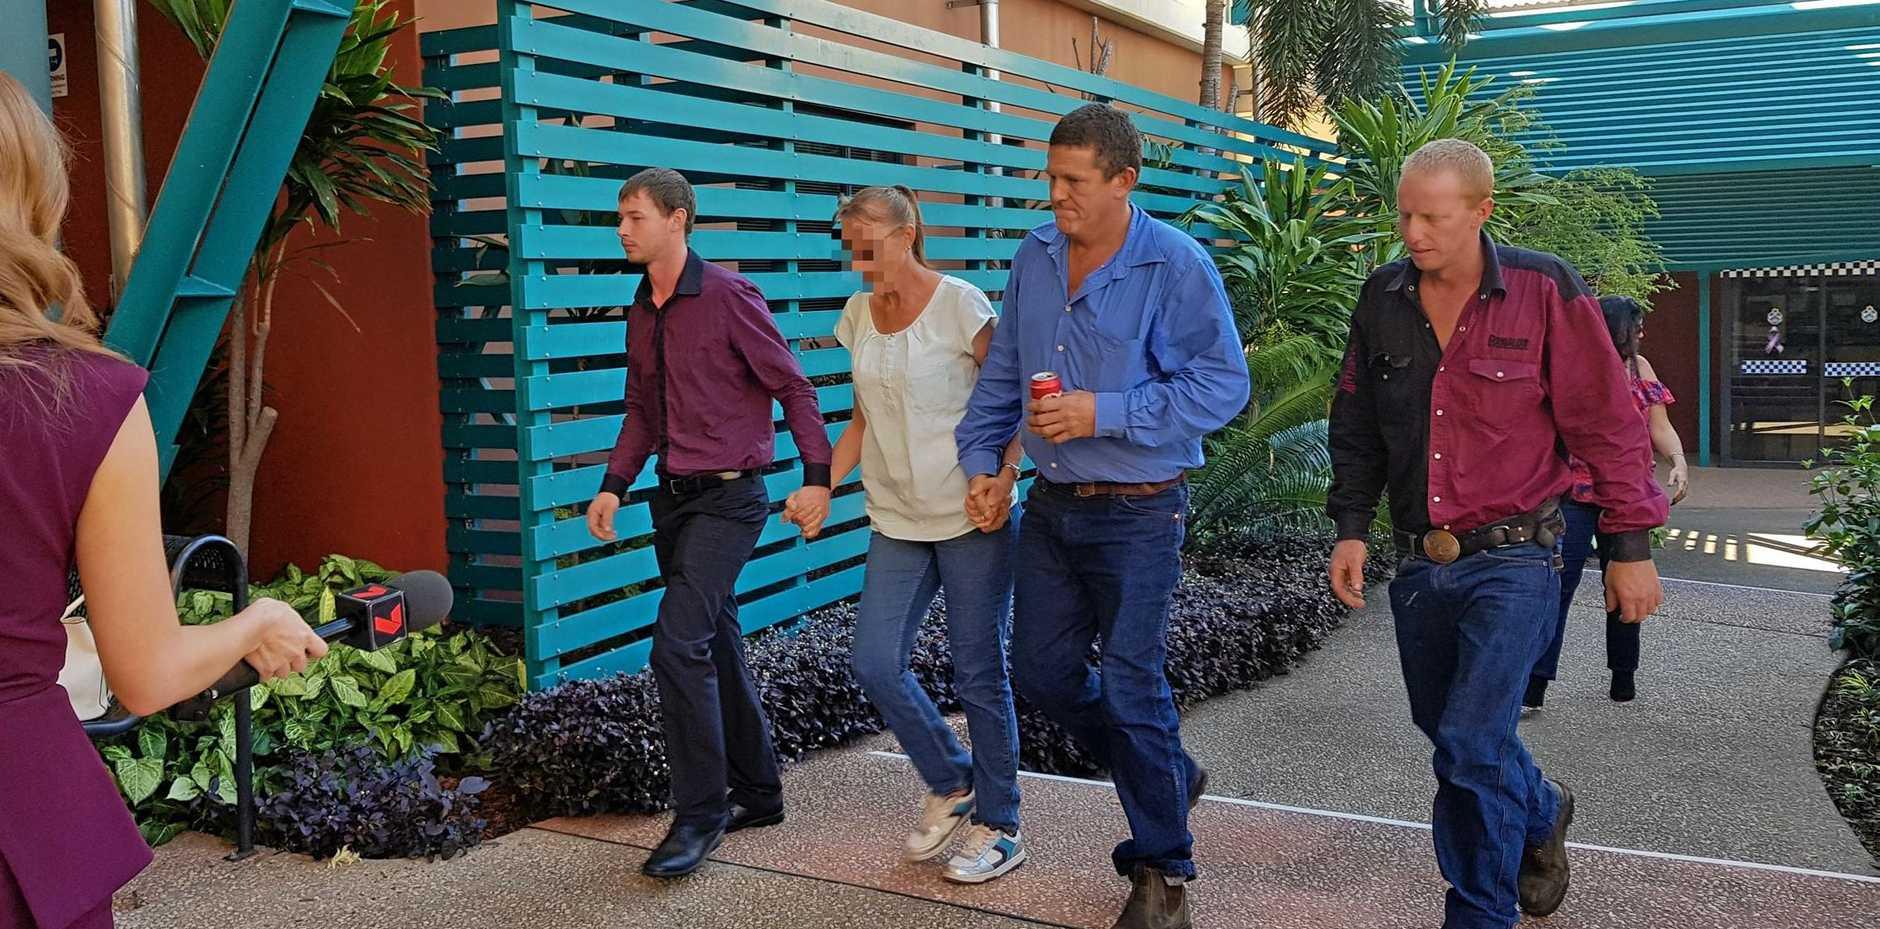 SENTENCED: (L-R) Matthew Douglas, Kenneth Douglas and Jesse Douglas enter Gladstone Court House before being sentenced.